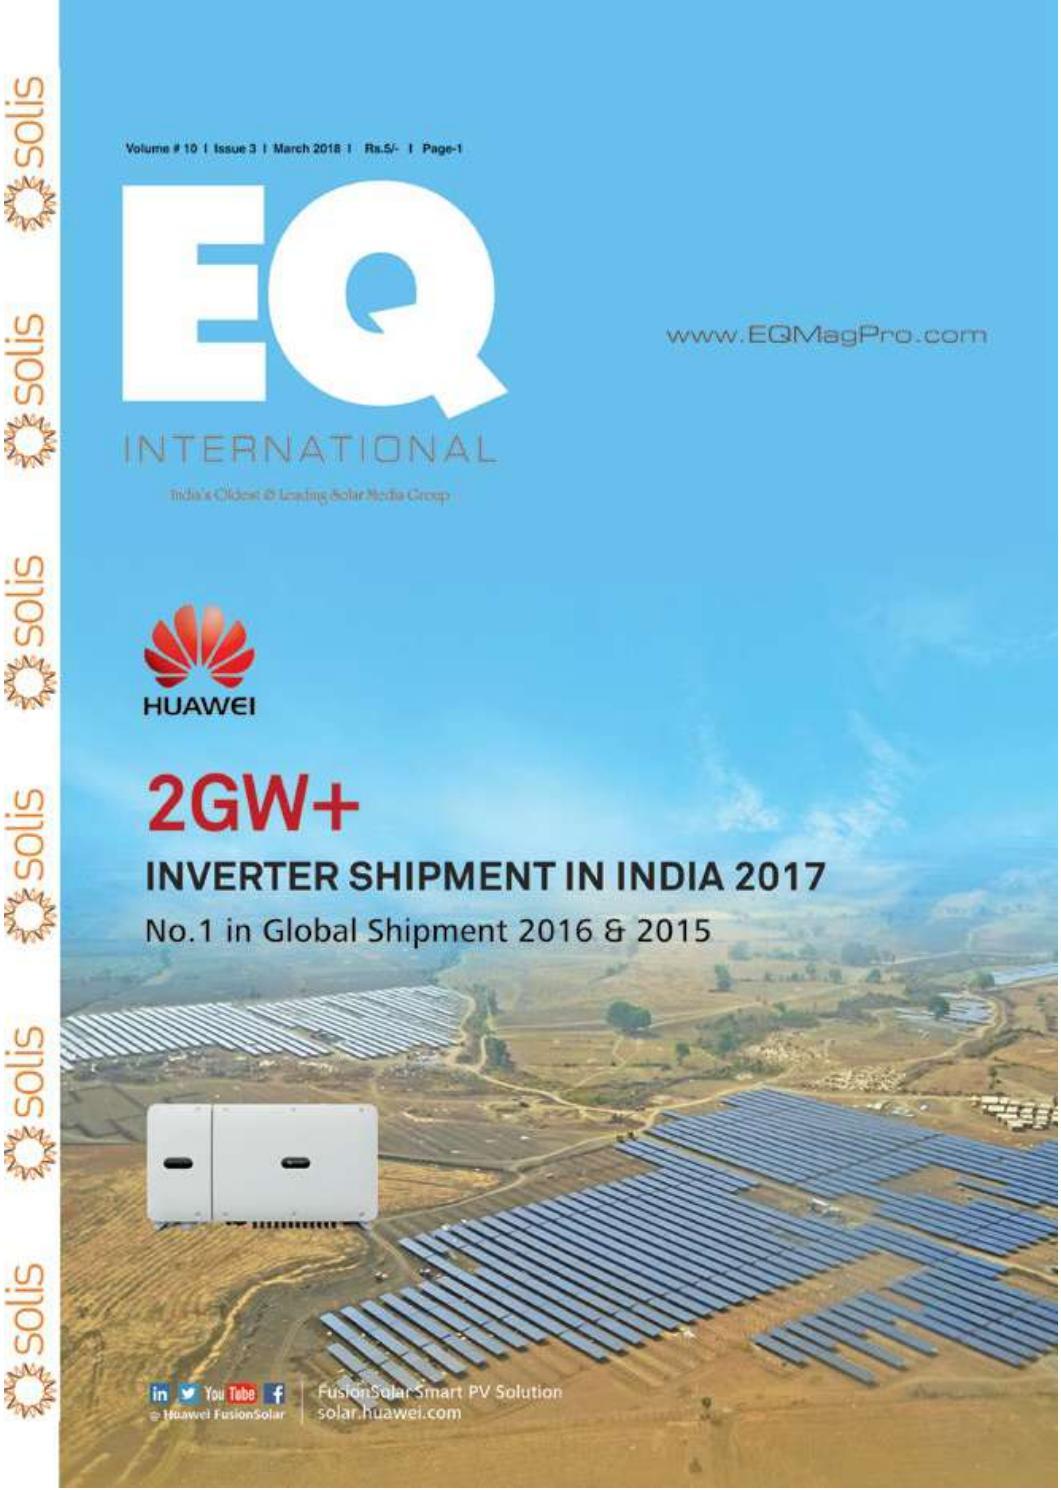 Eq Magazine March 2018 Edition By Intl Solar Media Group Issuu Skai Robust Offtheshelf Power Electronics For Emobility